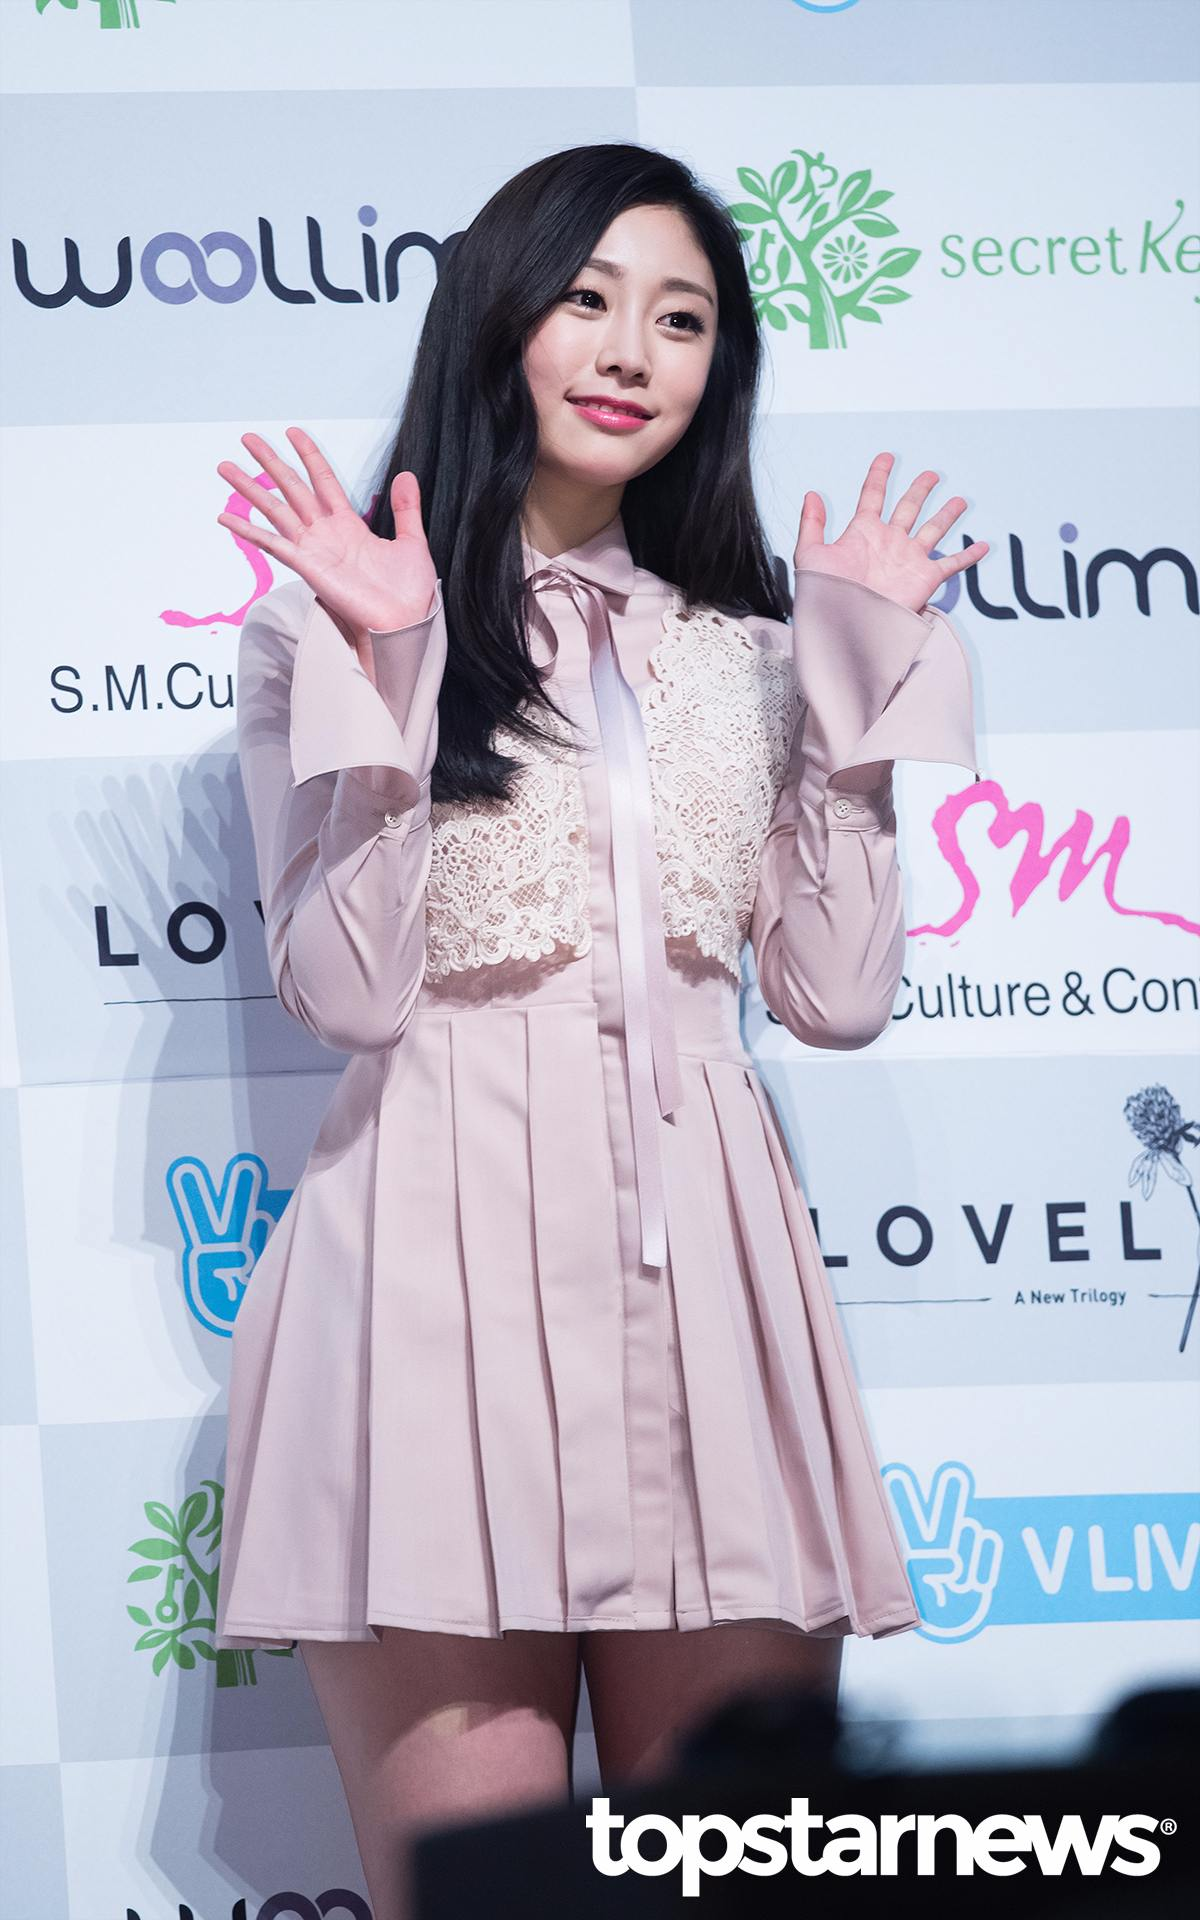 Lovelyz徐智秀,可以說是被女生粉絲討厭的最大受害者。還沒正式出道就因為在韓國知名以女性用戶為主的網站上傳的文章,而被傳成校園霸凌主使等等…因此延遲了出道。